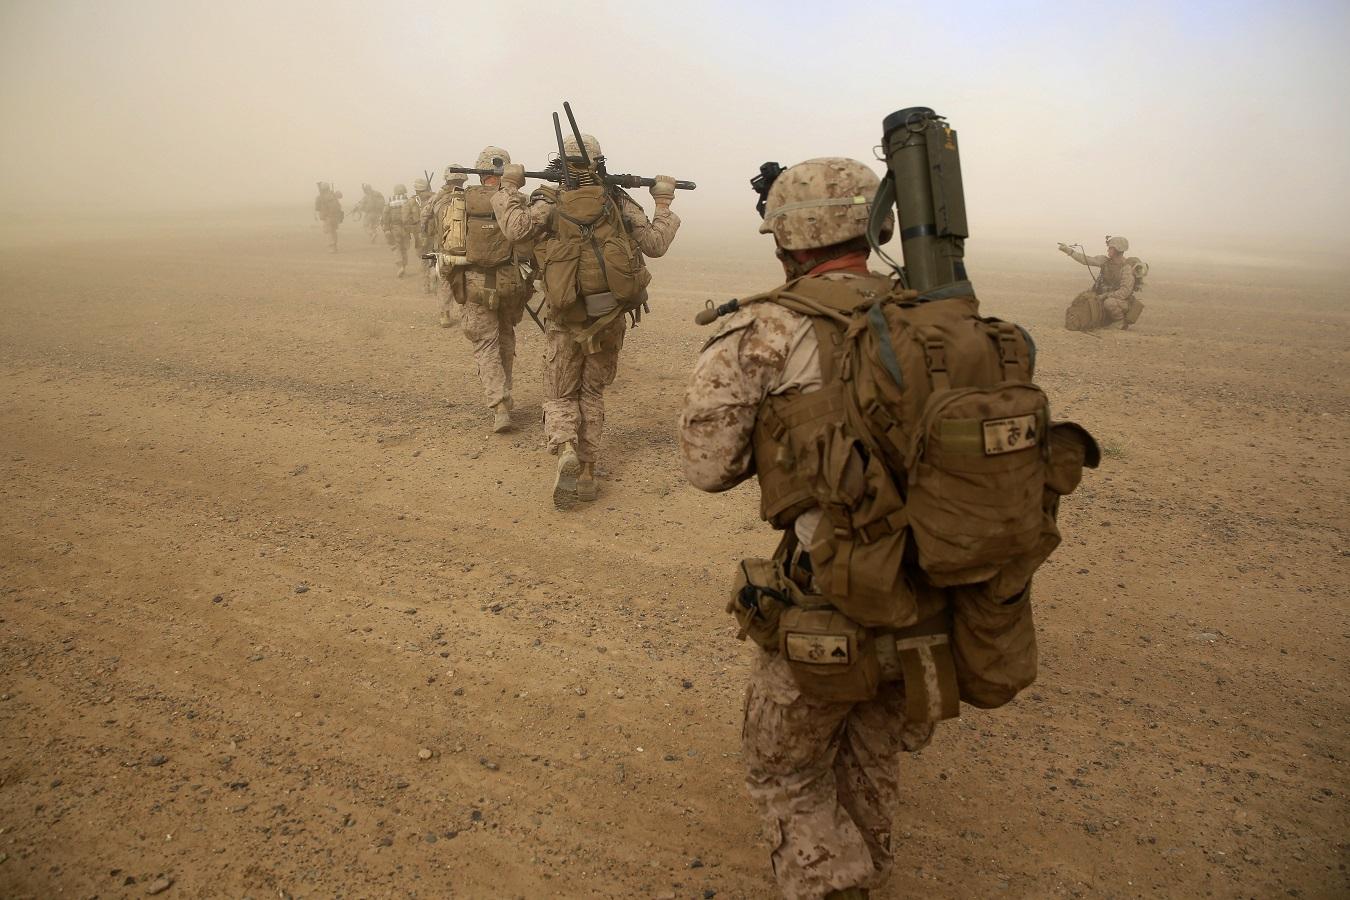 New Marines arrive in Afghanistan